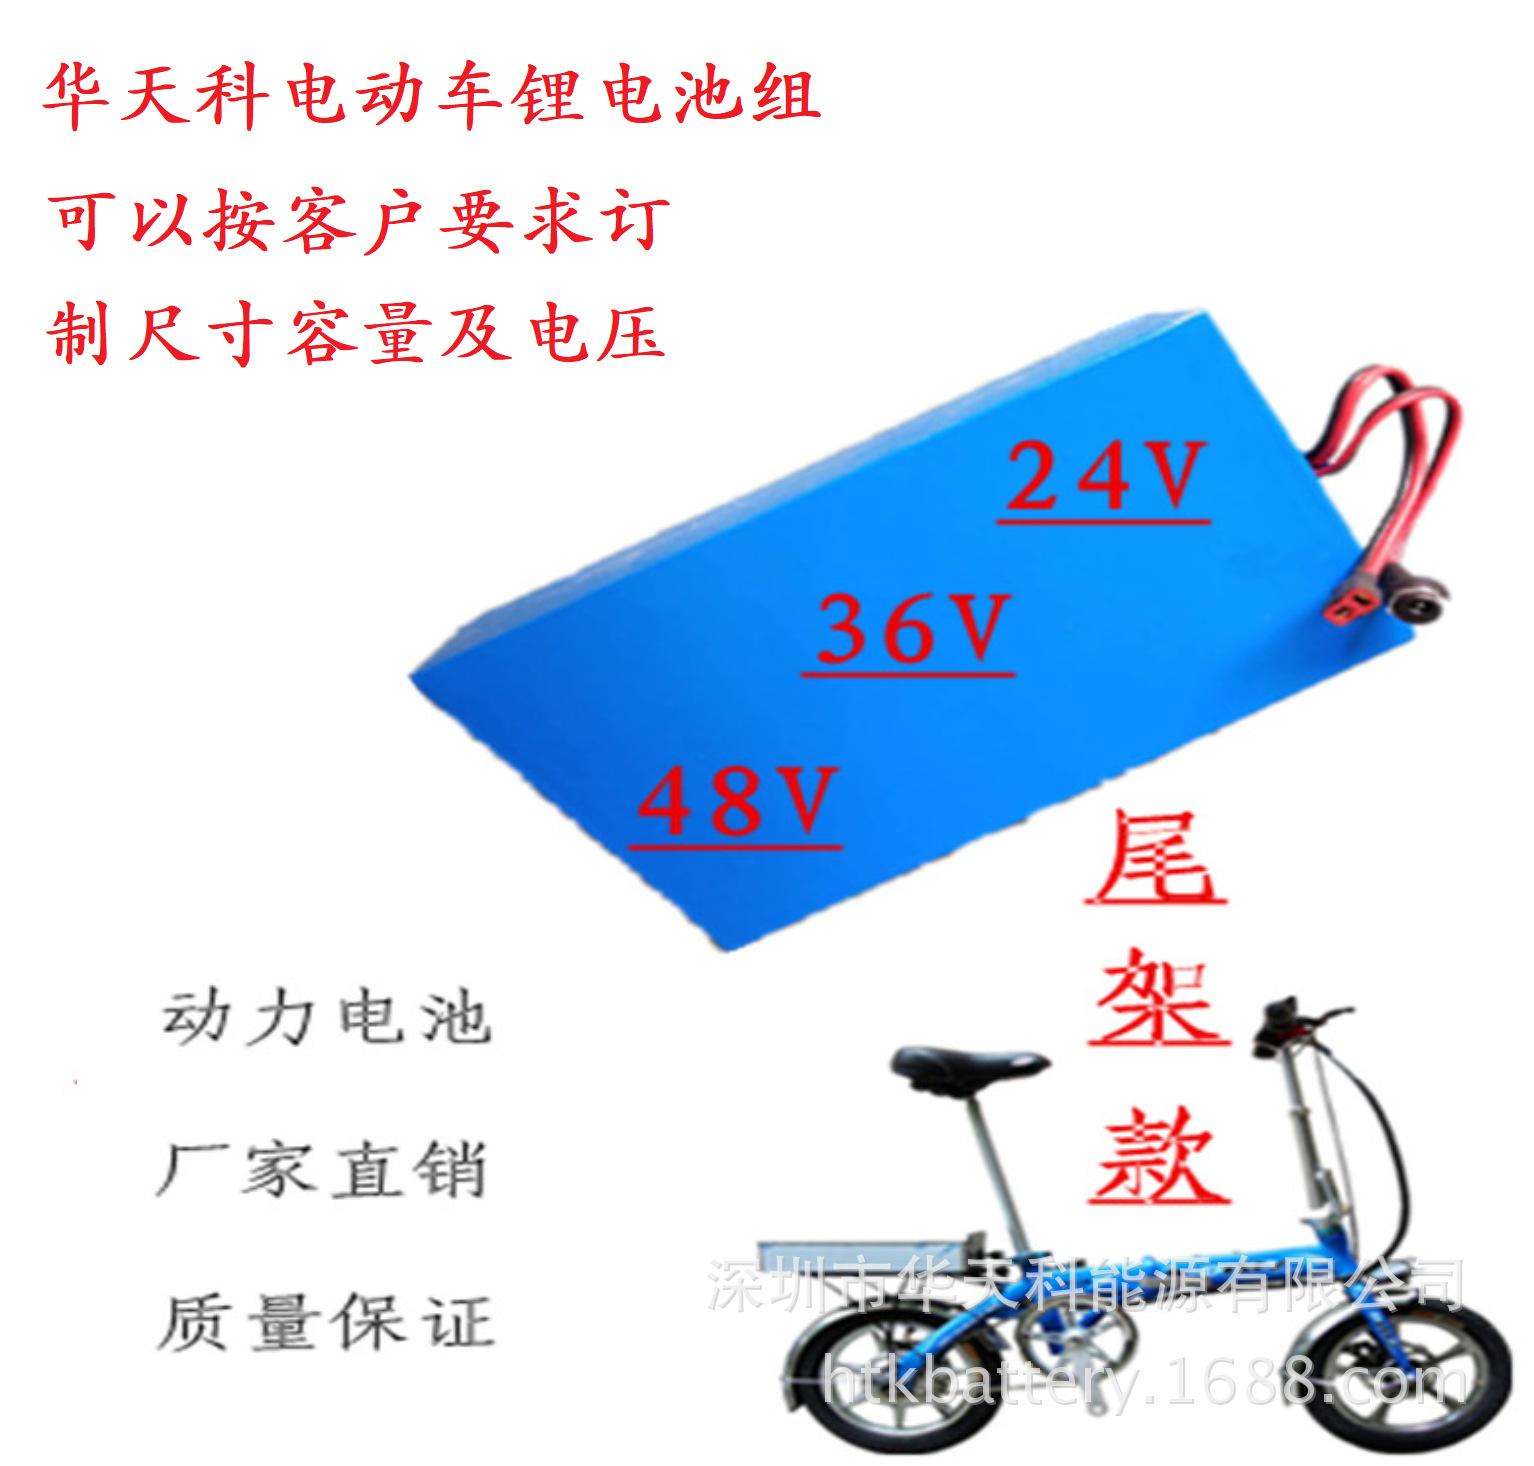 24V36V48V电动车电池8AH10AH12AH15AH18AH20AH电动自行车锂电池